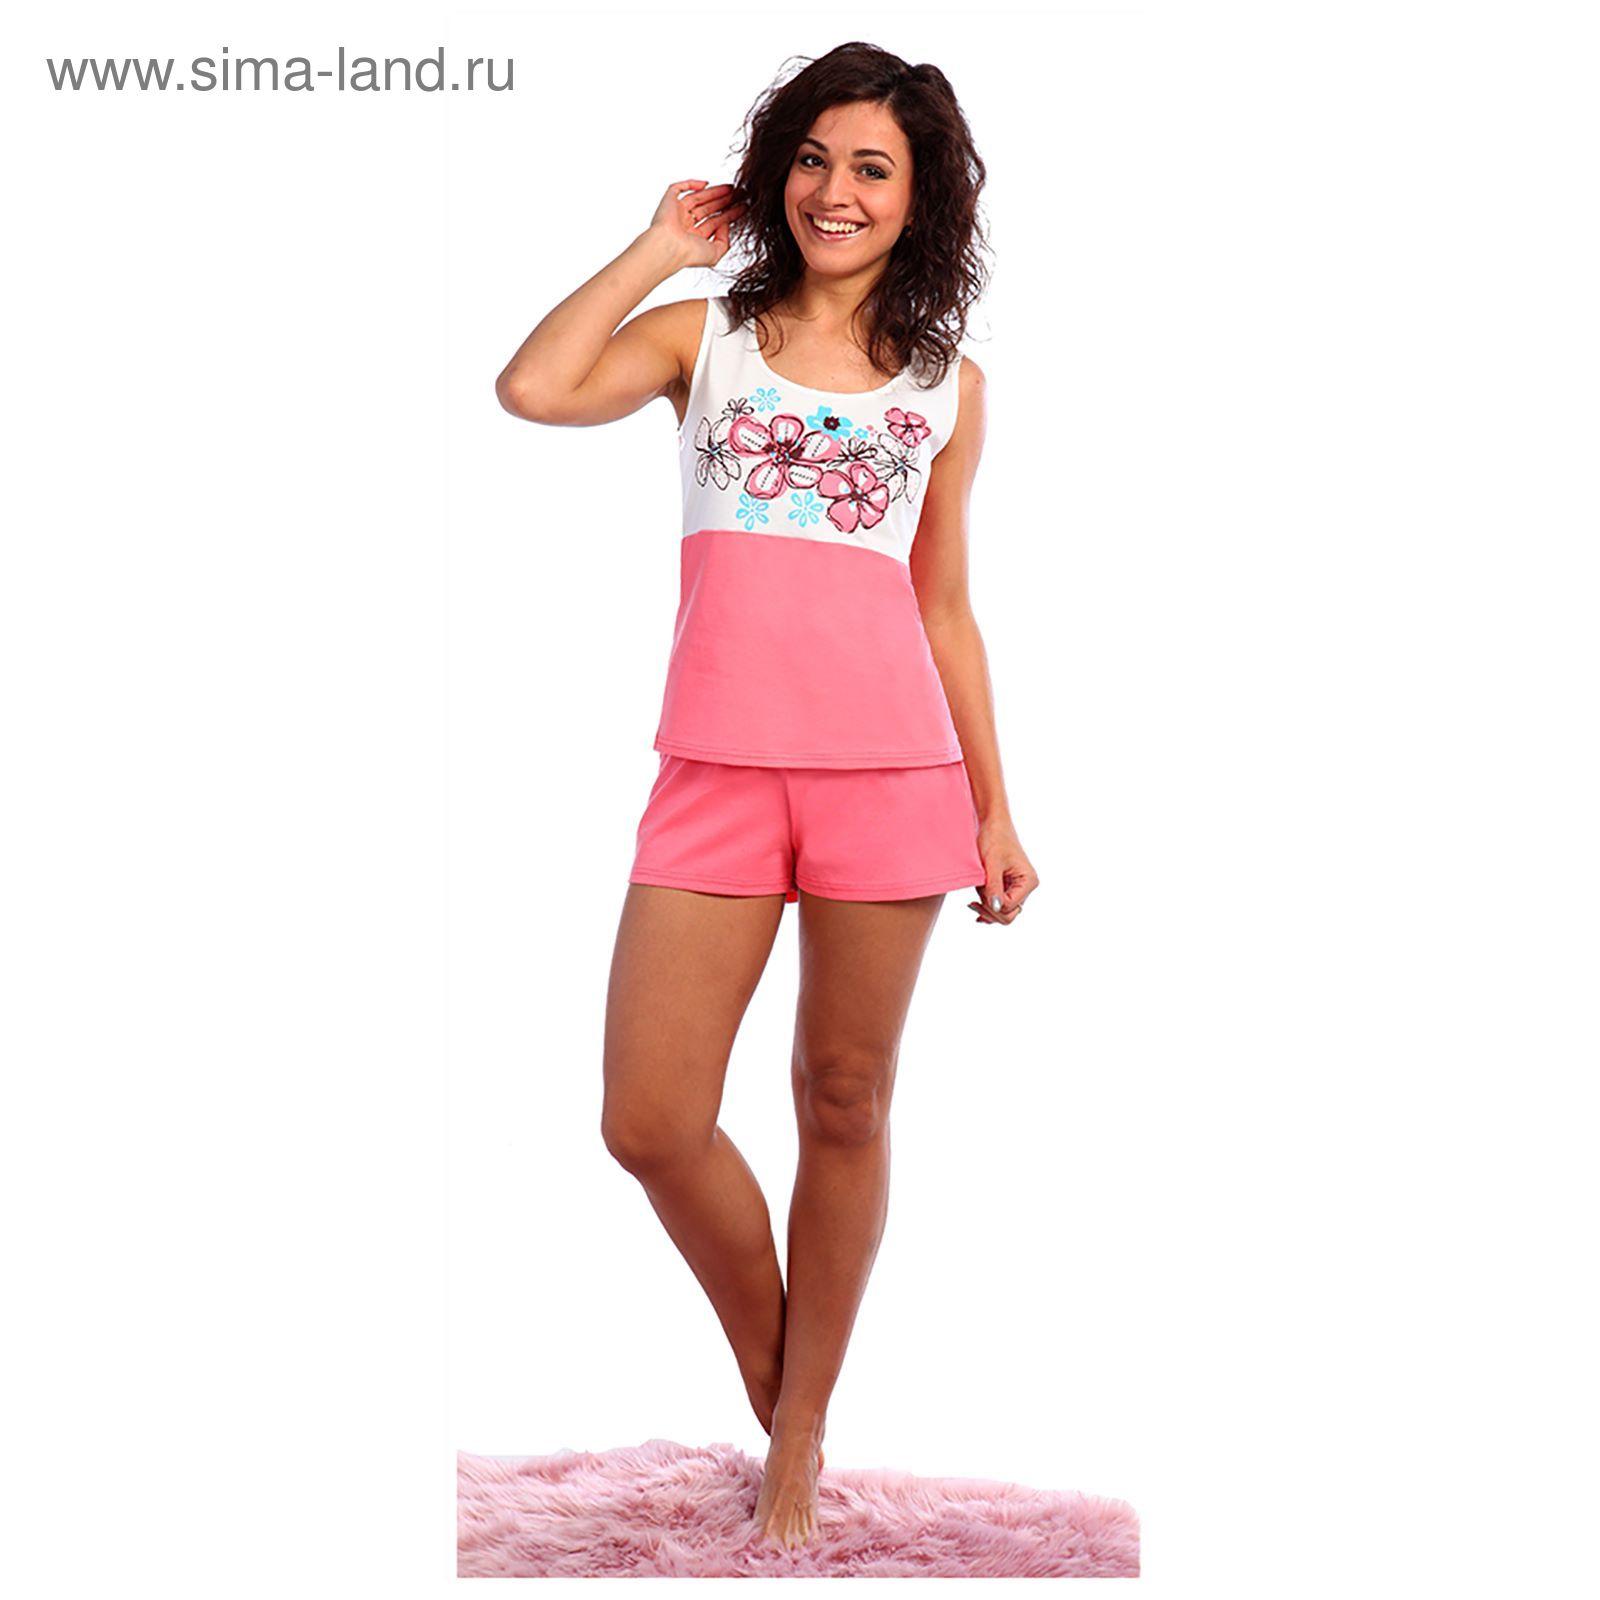 12783a15fa17842 Пижама женская (майка, шорты) Незабудка цвет коралловый, р-р 42 (943 ...